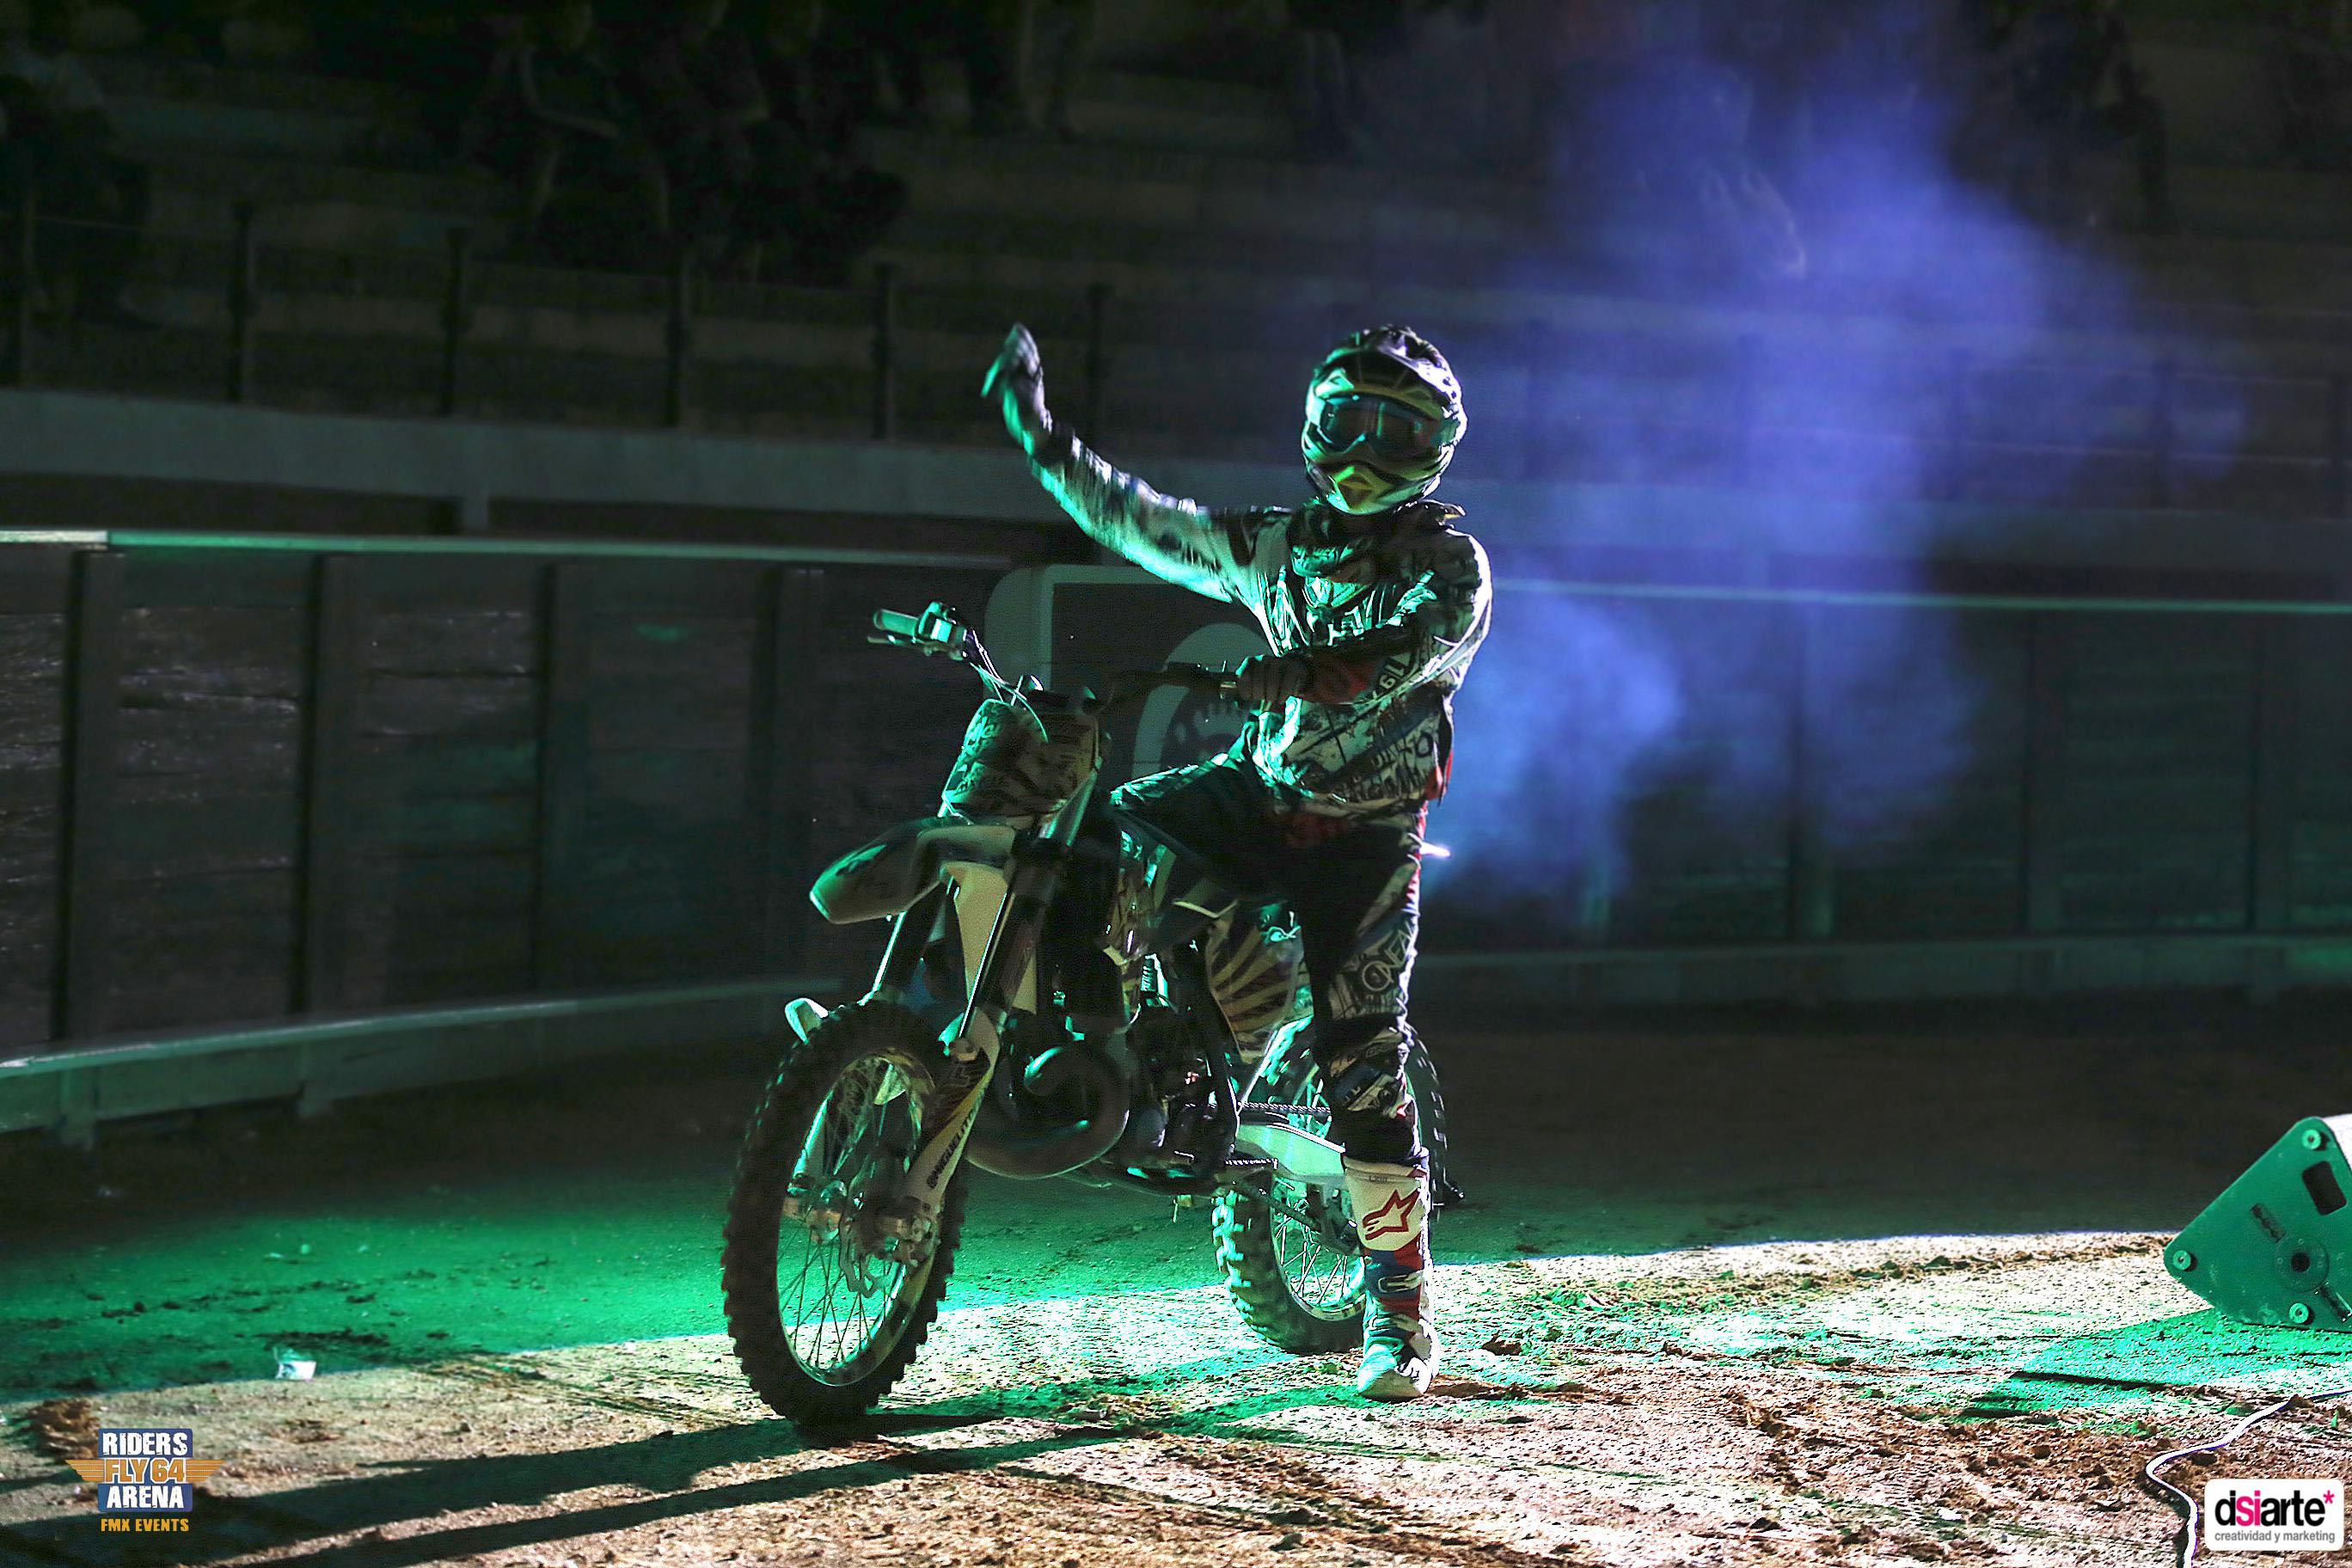 Fotografía de eventos Albacete Summer Night Tour 2015, freestyle motocross cup 2015, ryders fly arena